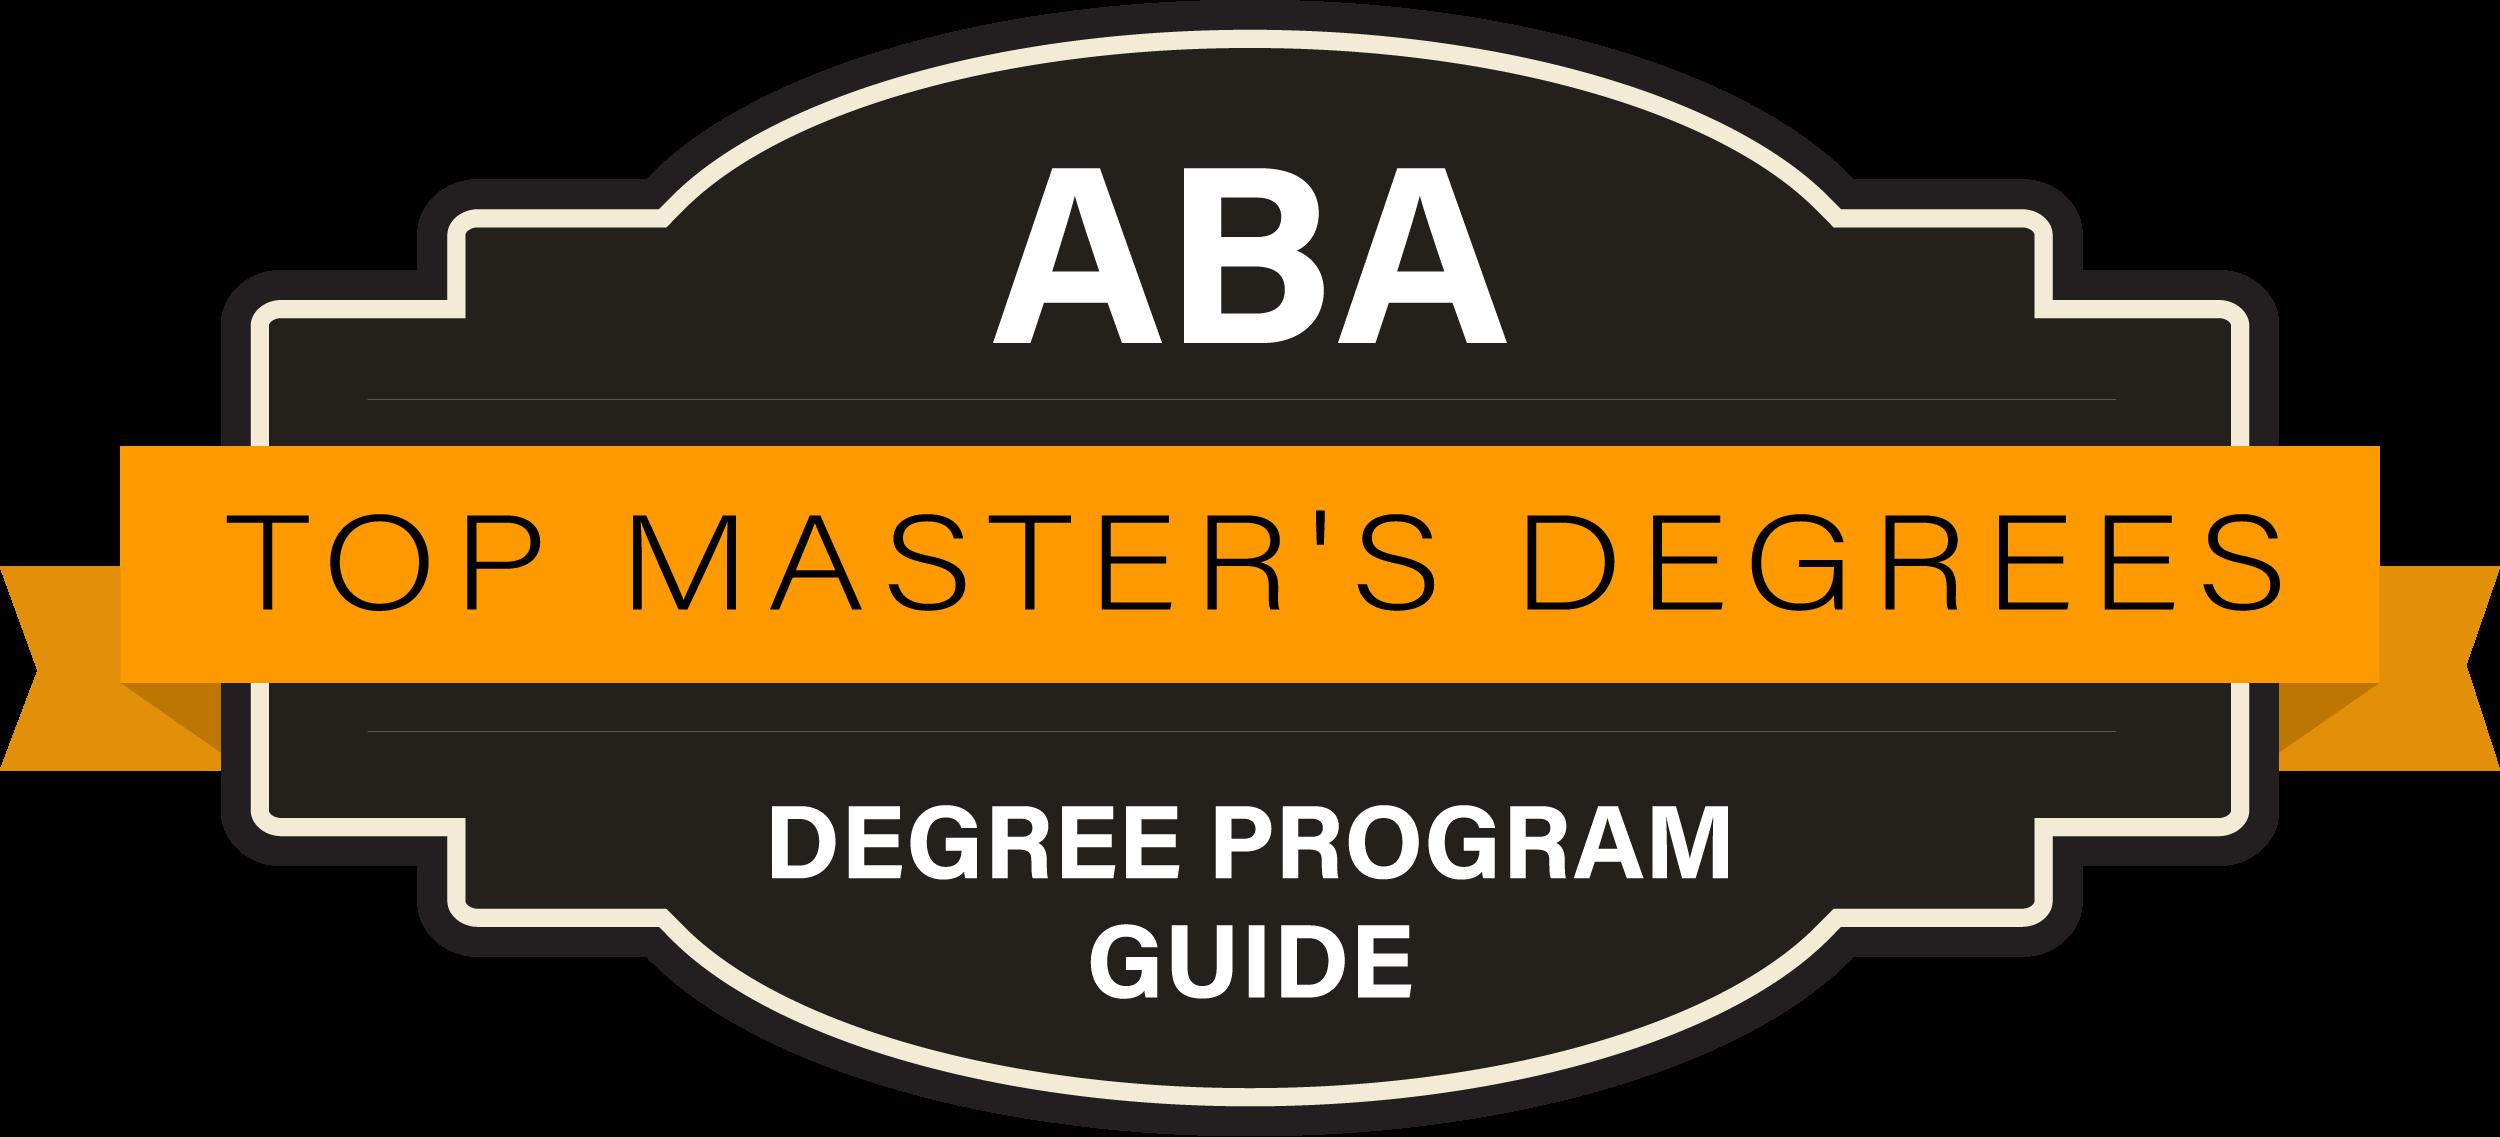 10 Best ABA Master's Degree Programs 2018 | ABA Degree